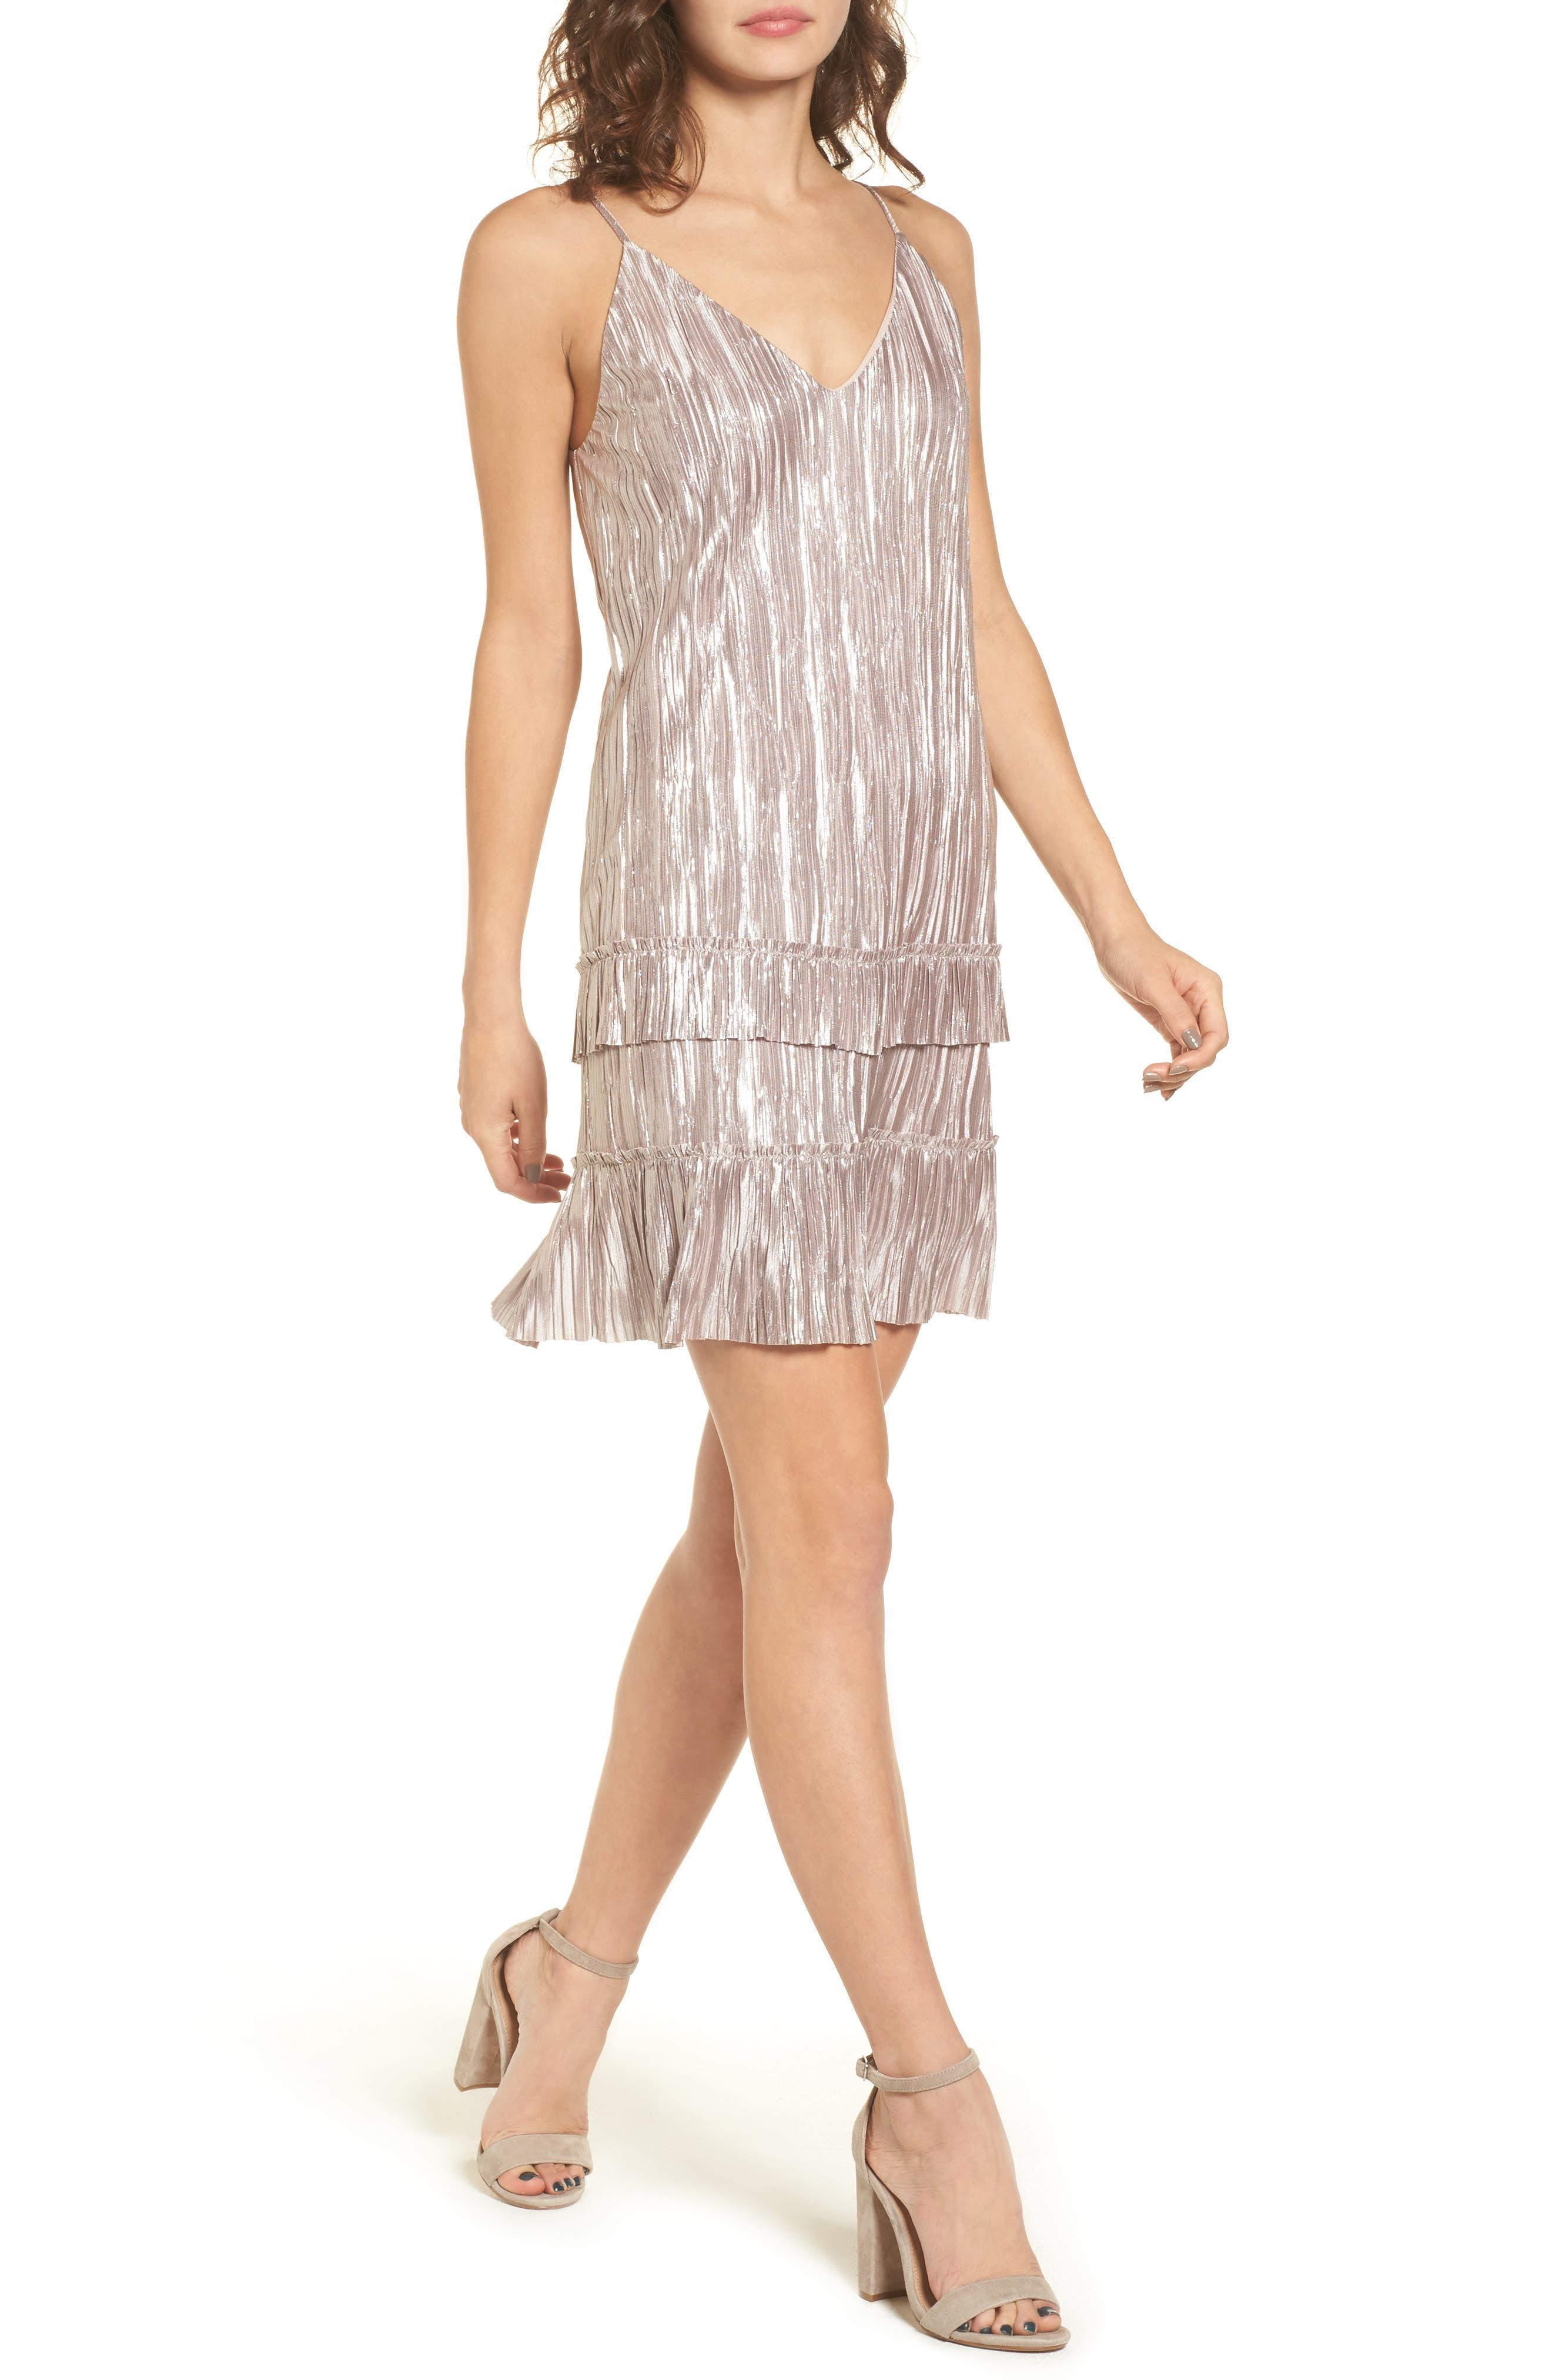 Bastille Slip Dress,                         Main,                         color, 250